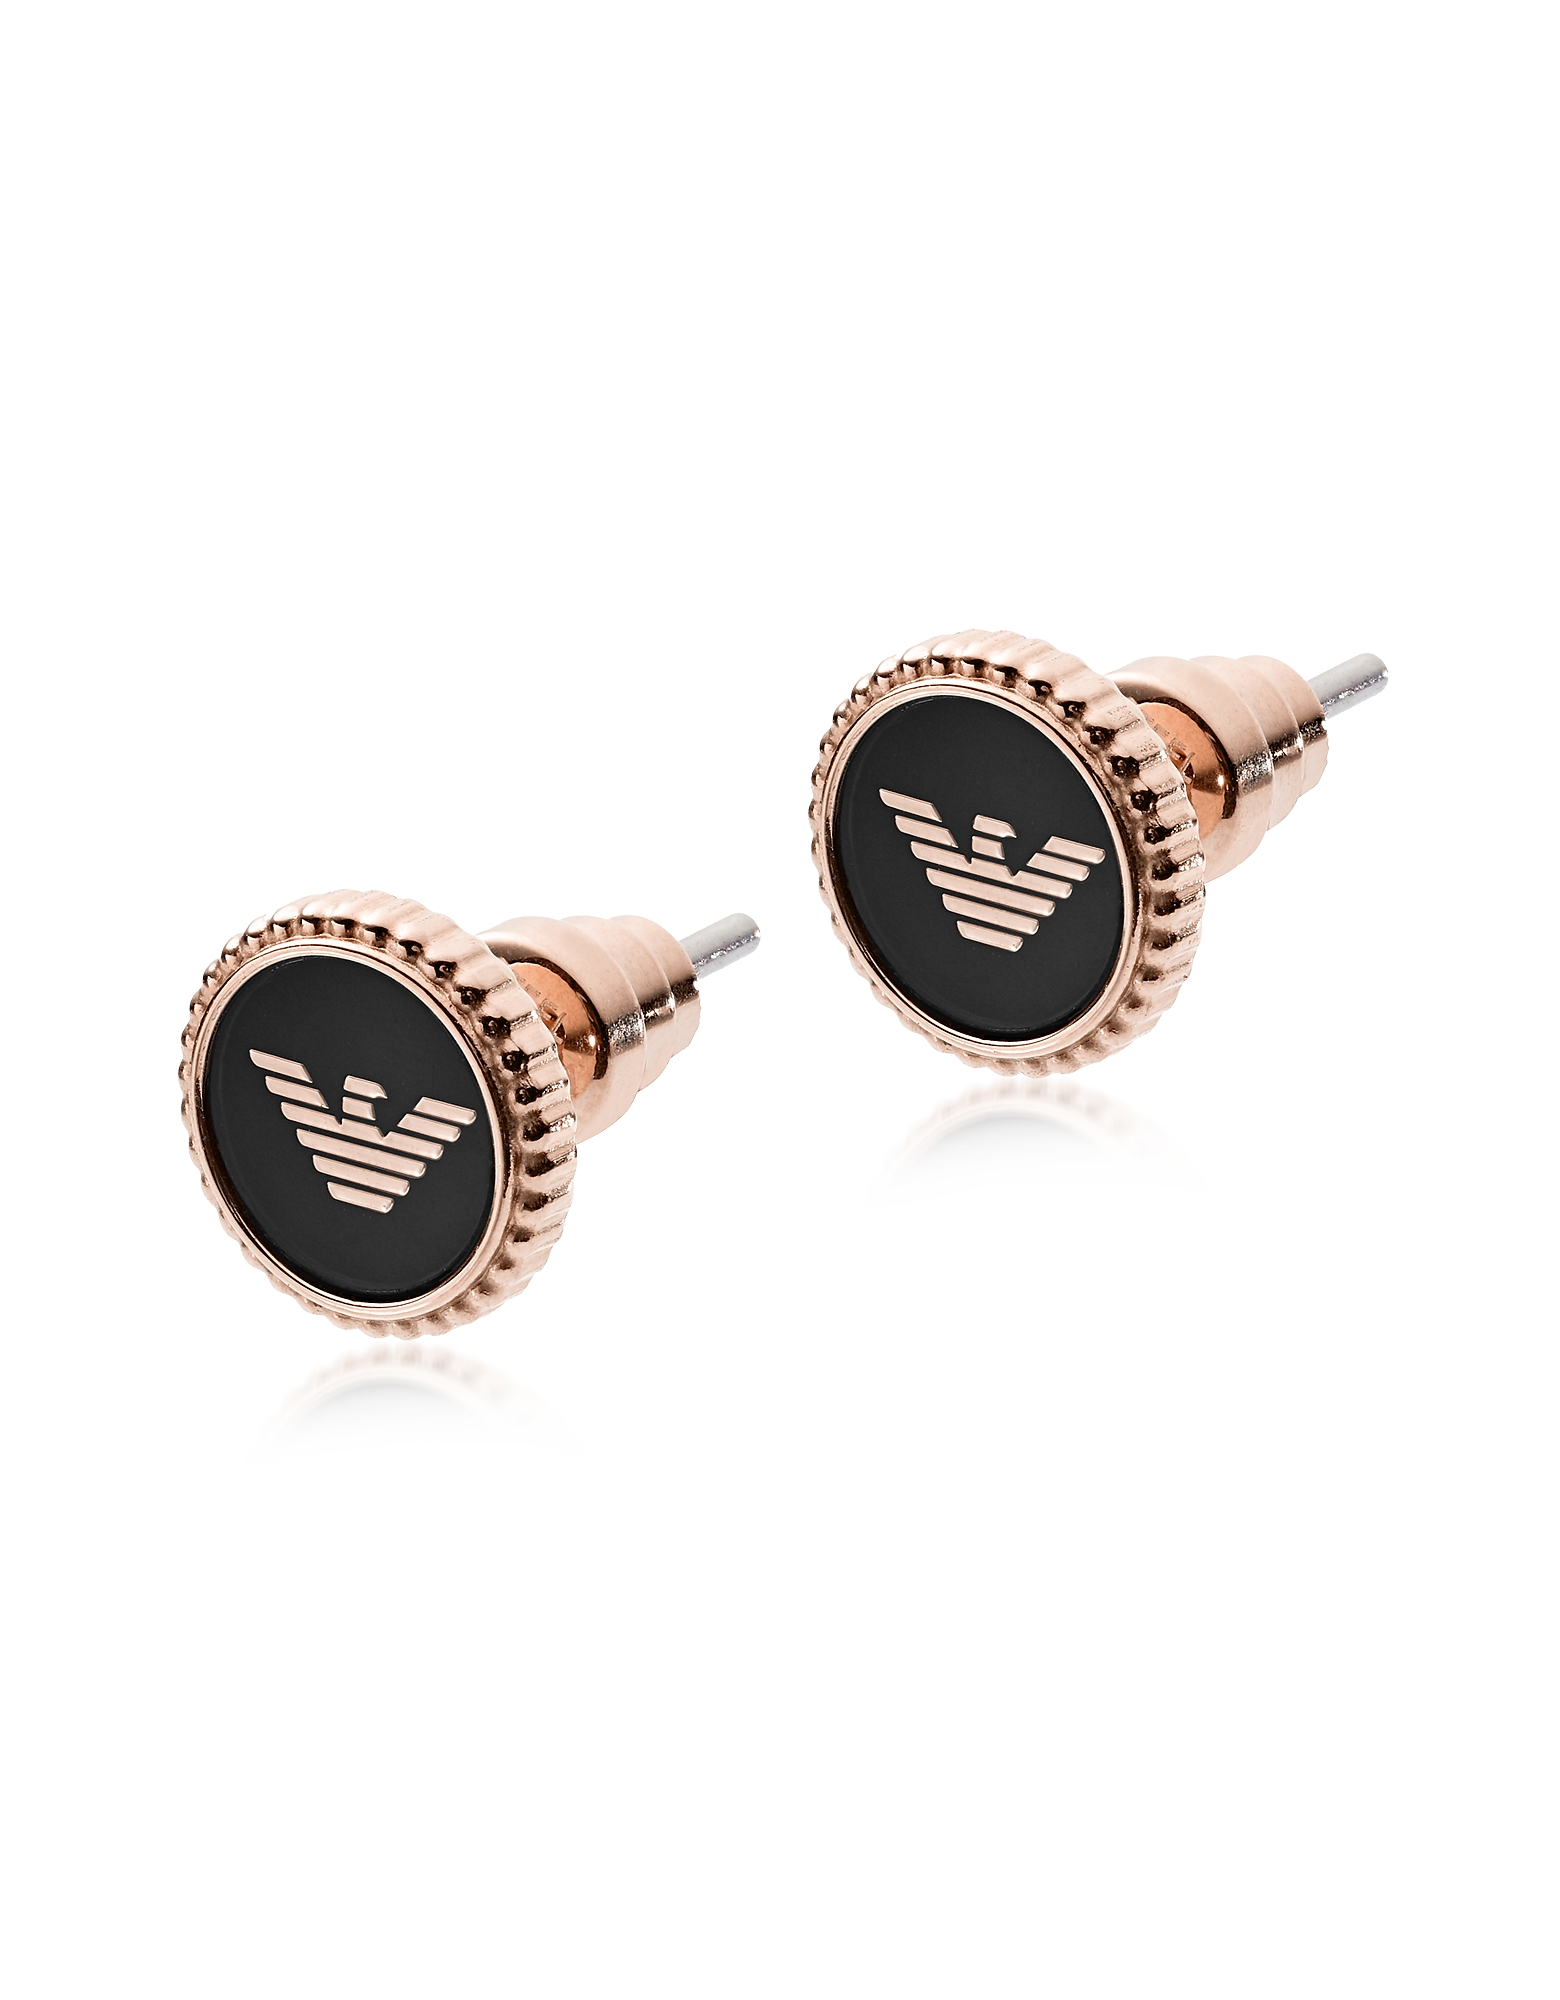 Rose Gold Stainless Steel and Black Enamel Signature Women's Earrings